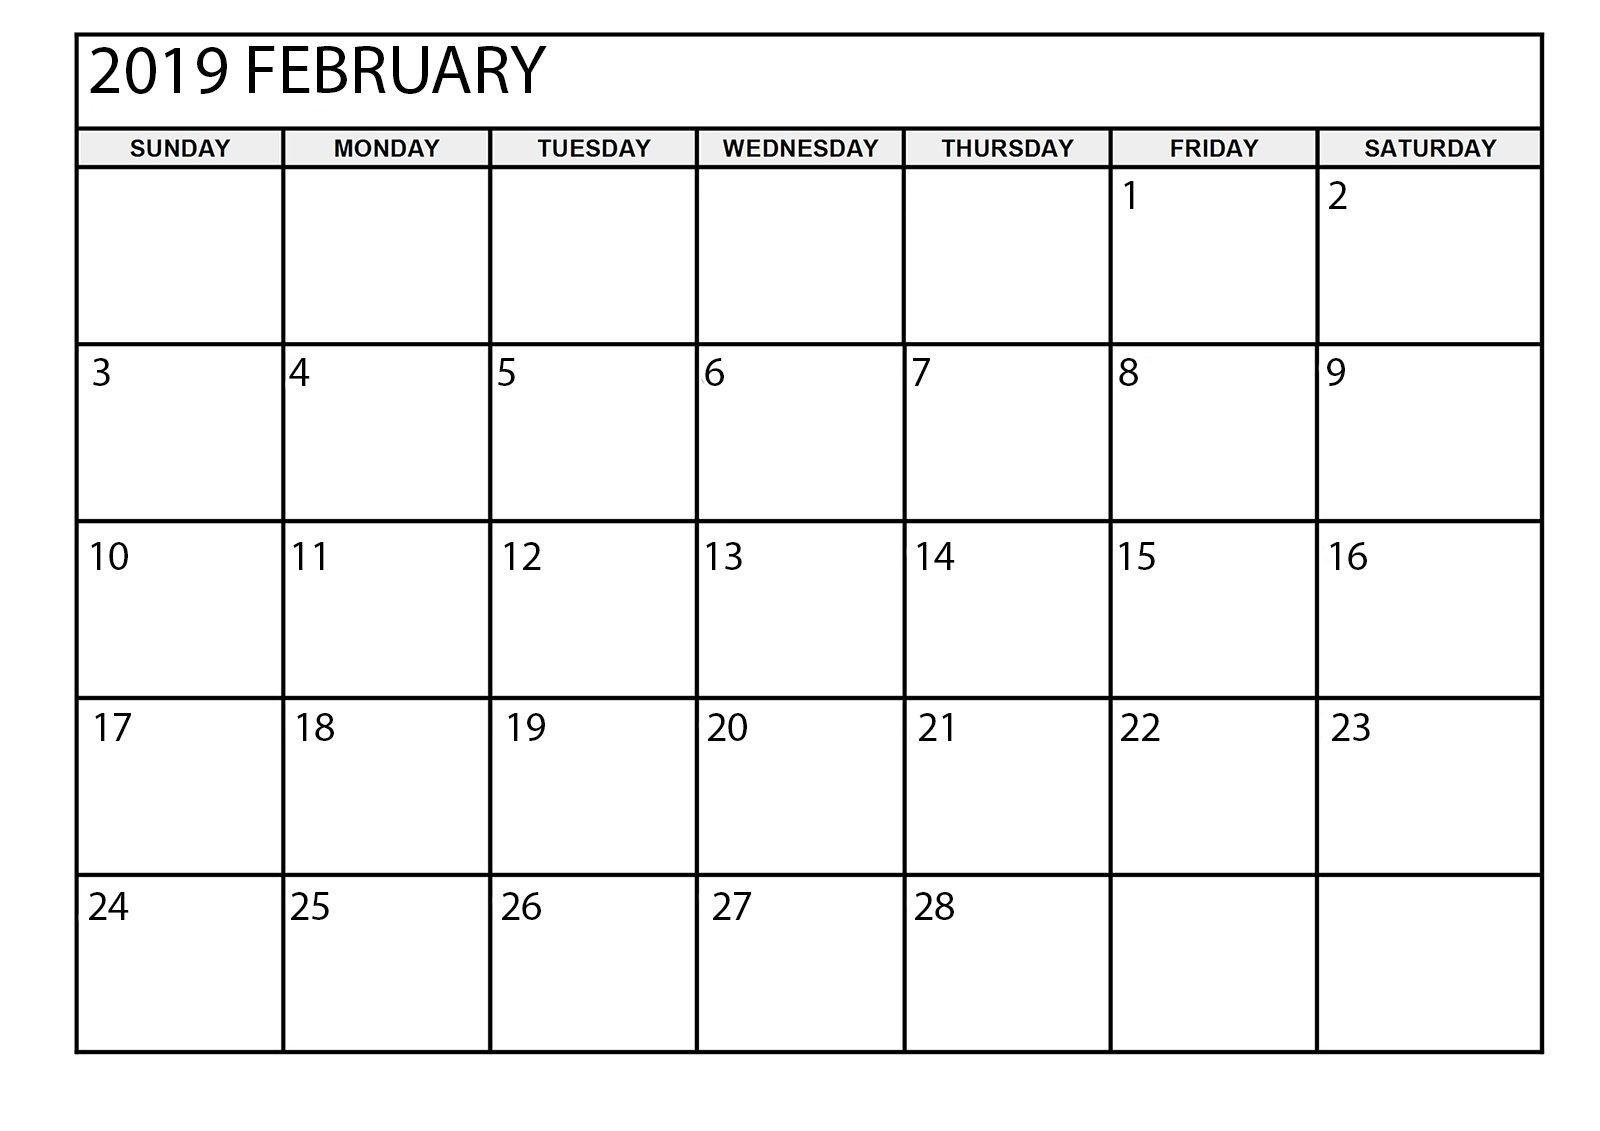 February 2019 Calendar Printable Large | August Calendar